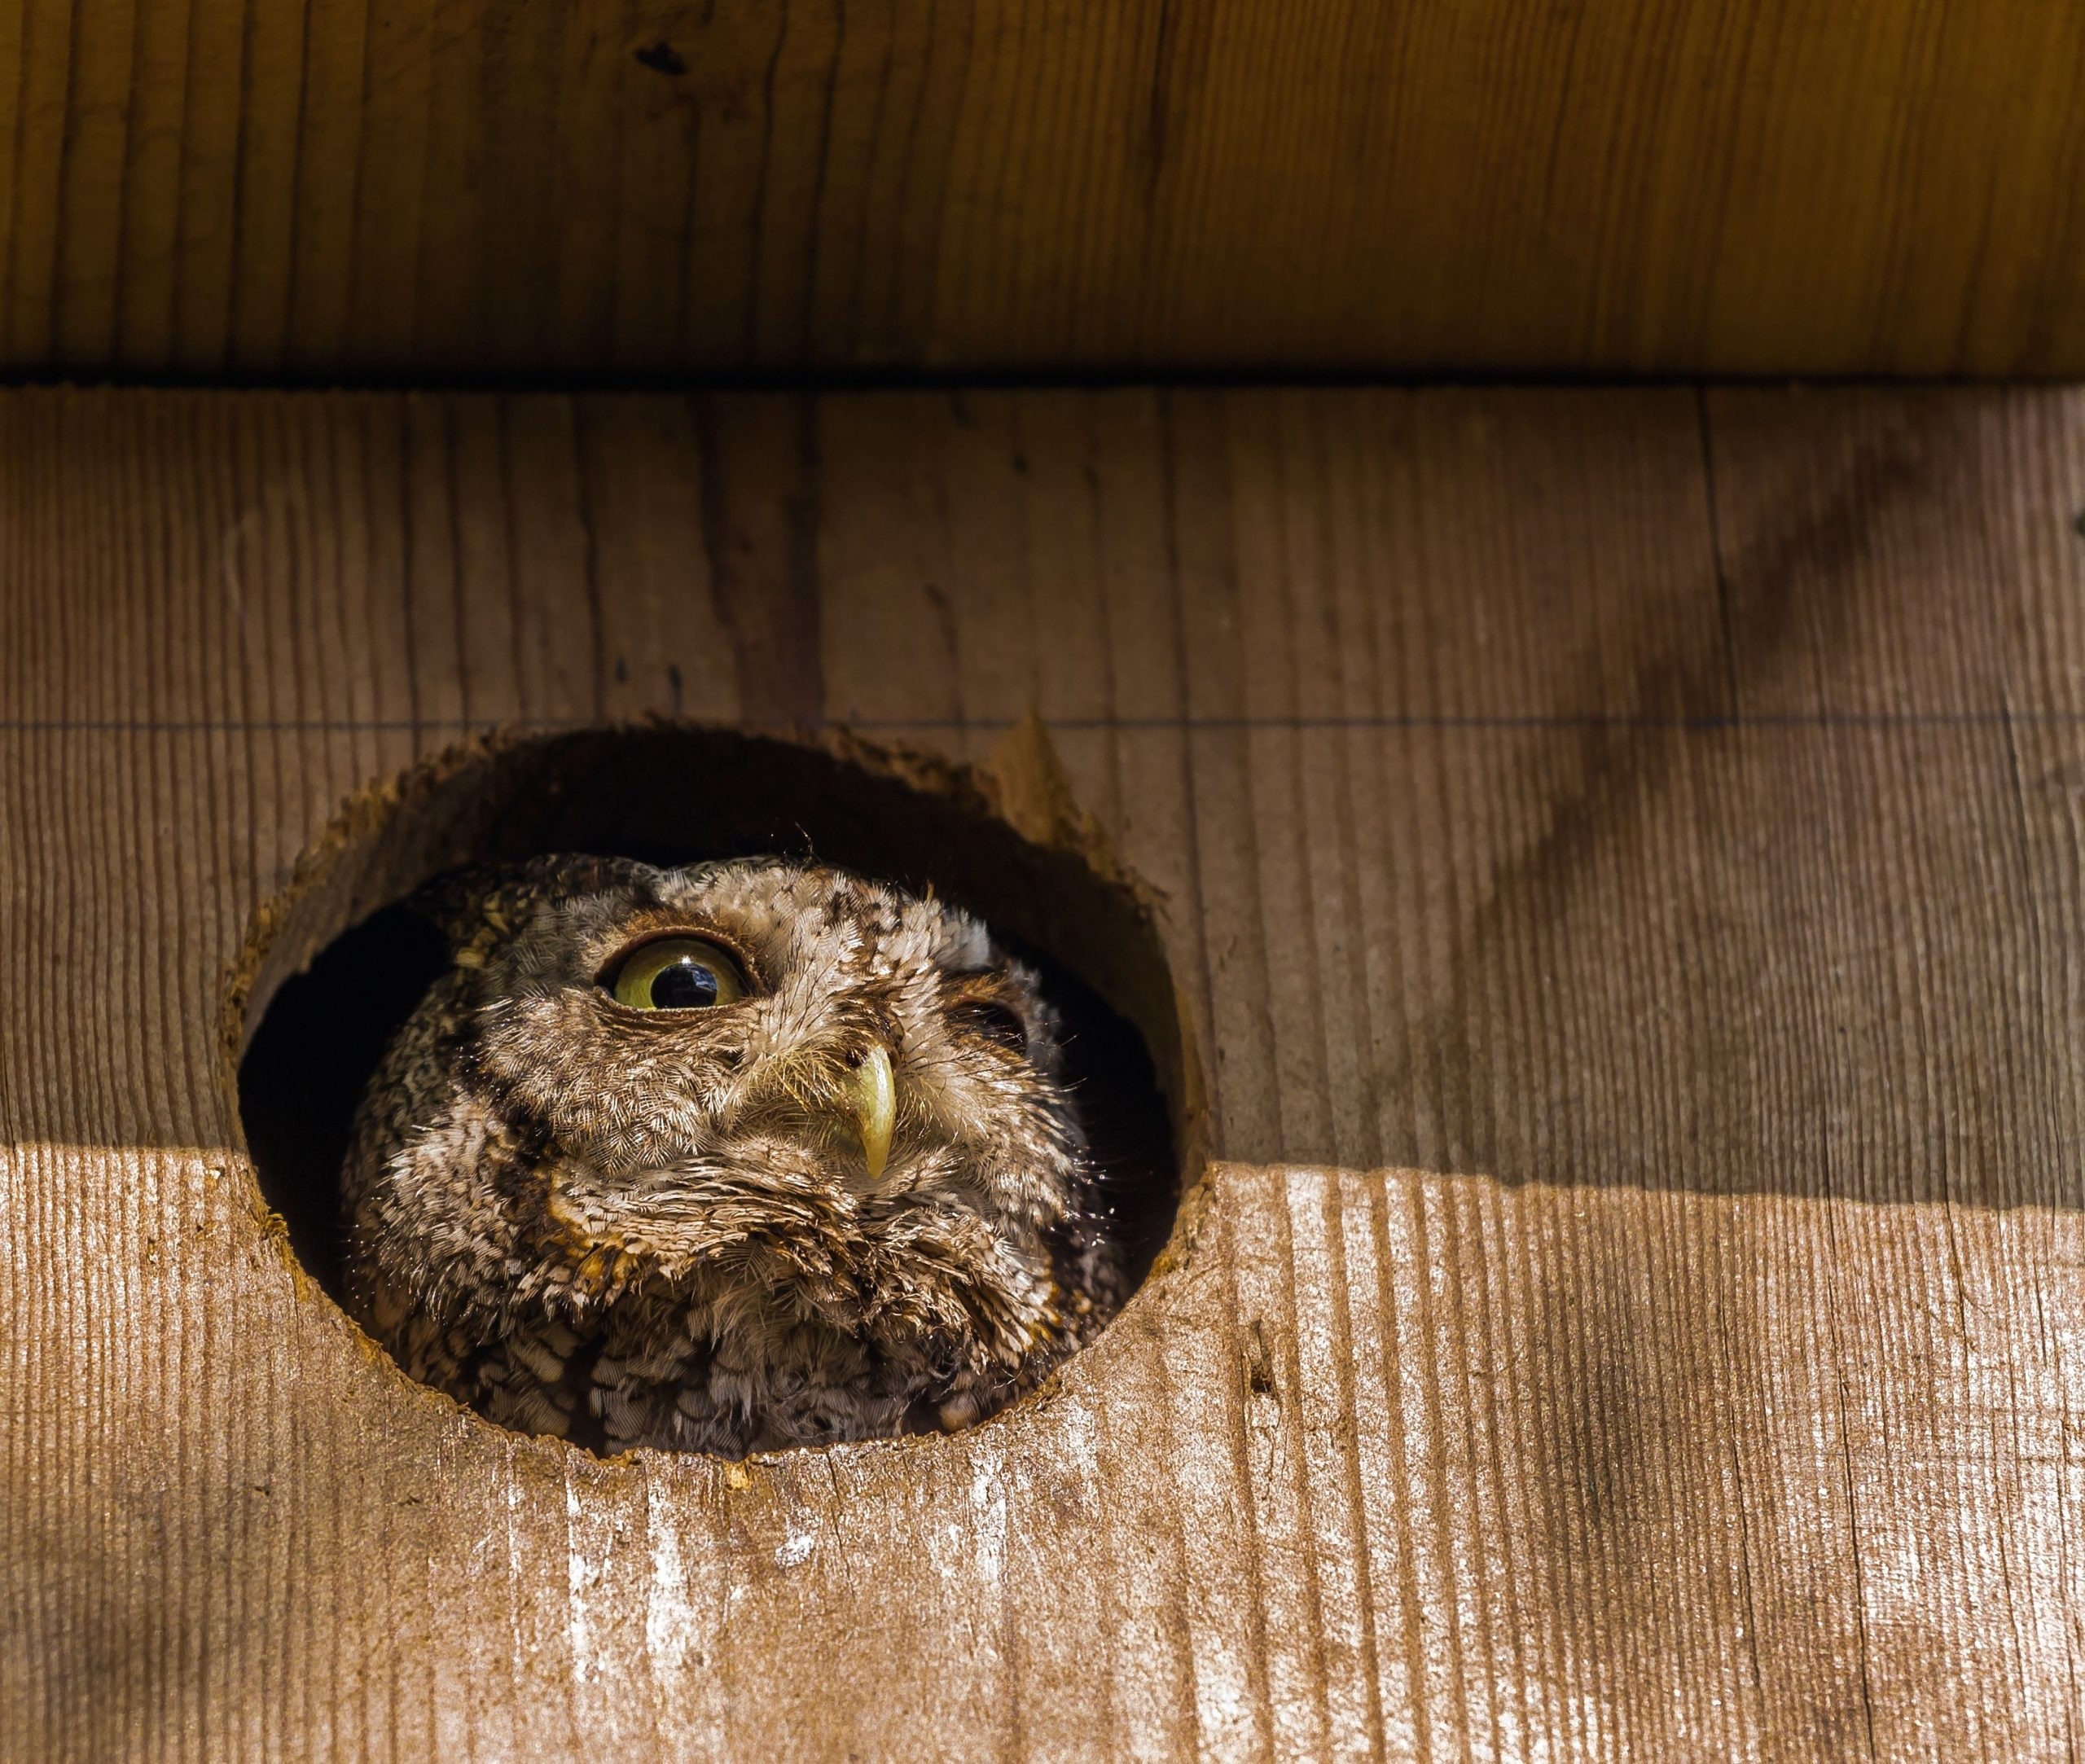 Close up of screech owl in owl nesting box